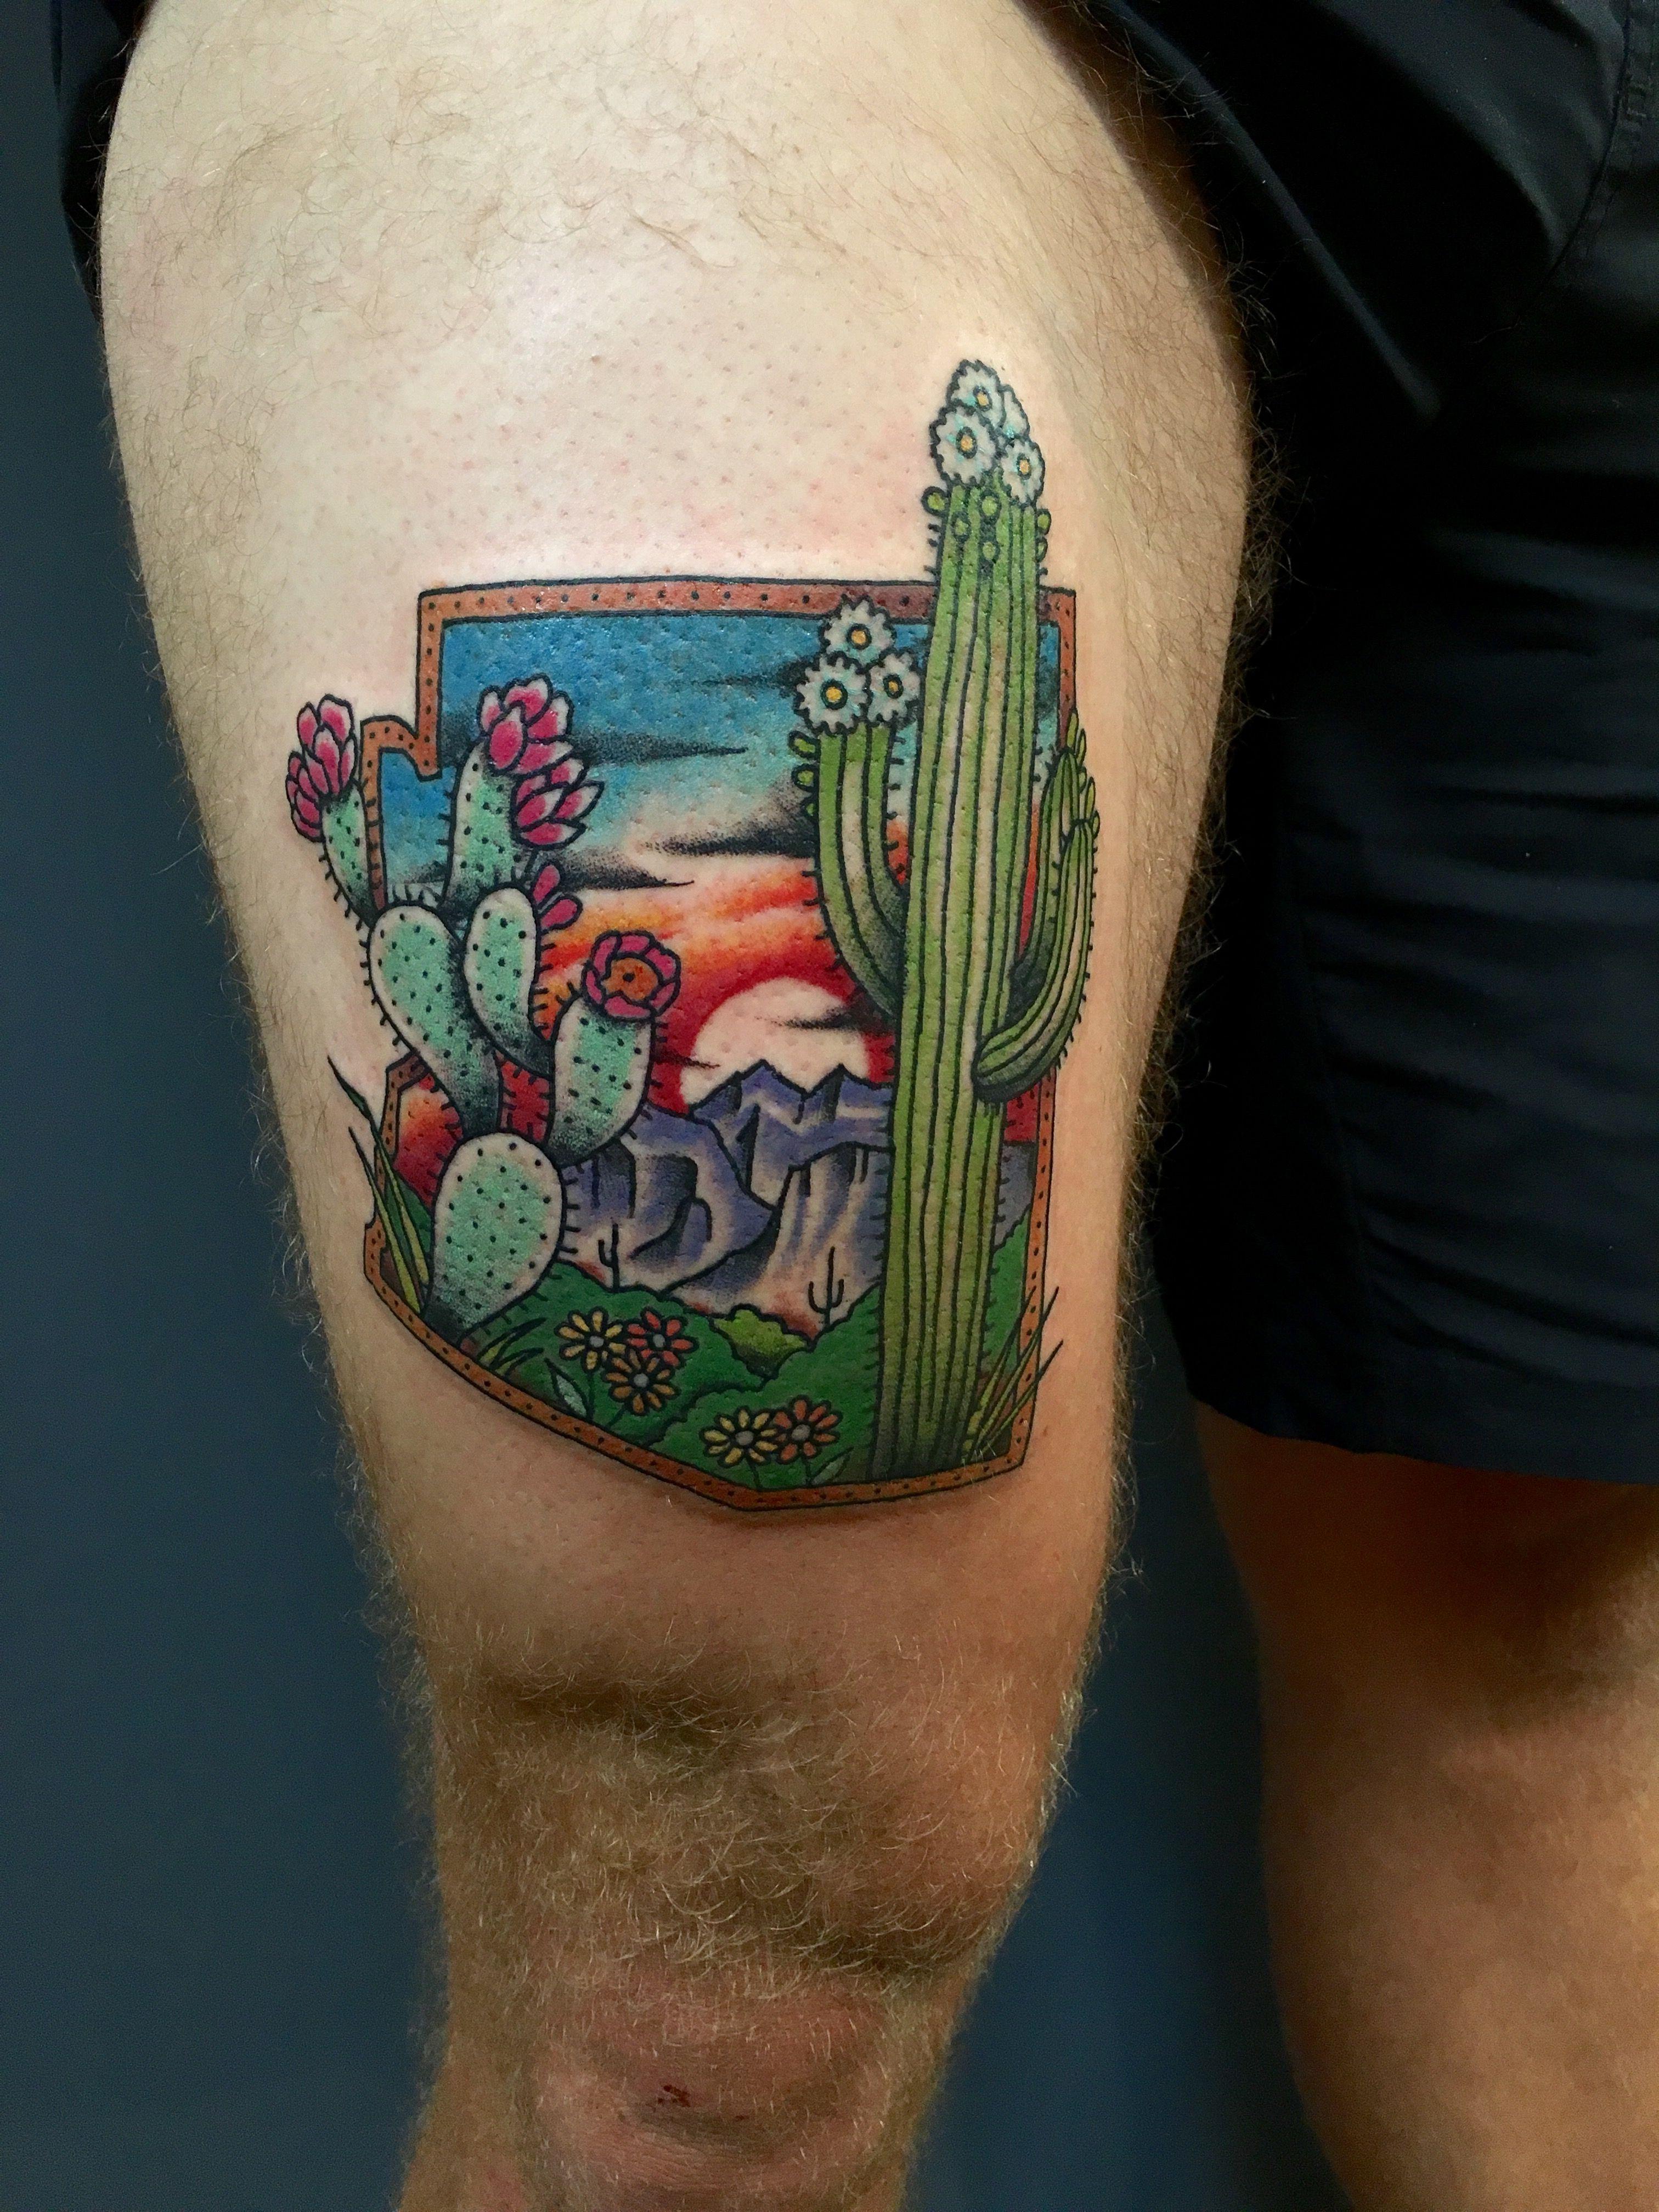 Blooming Arizona Desert By Paulski At Golden Rule Tattoo In Phoenix